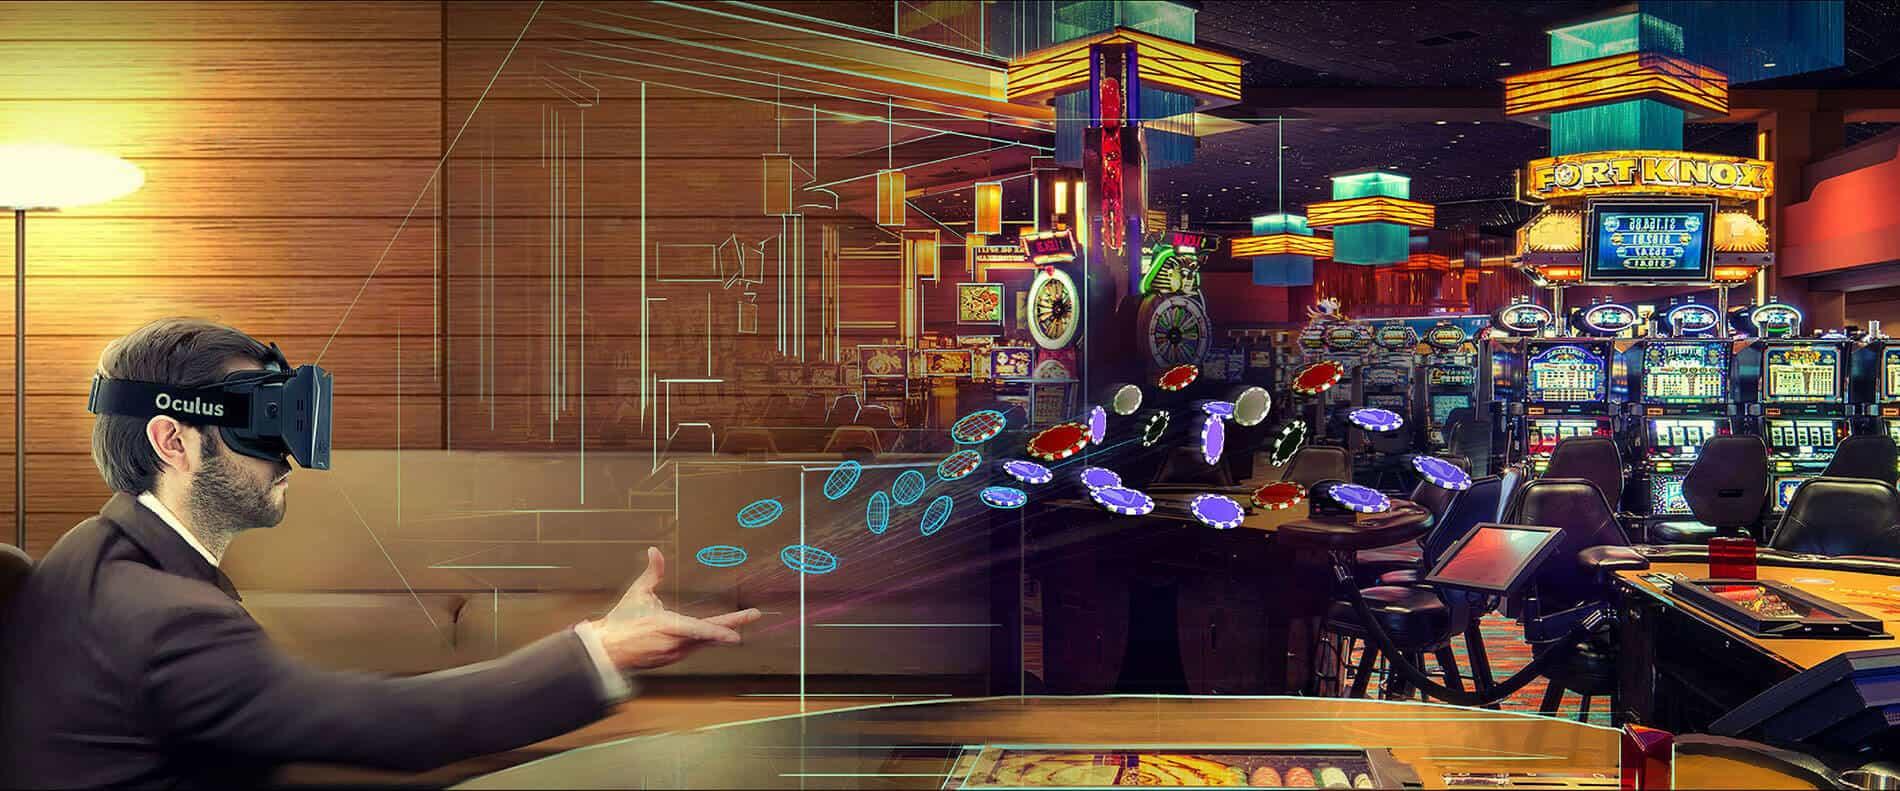 casino-vr